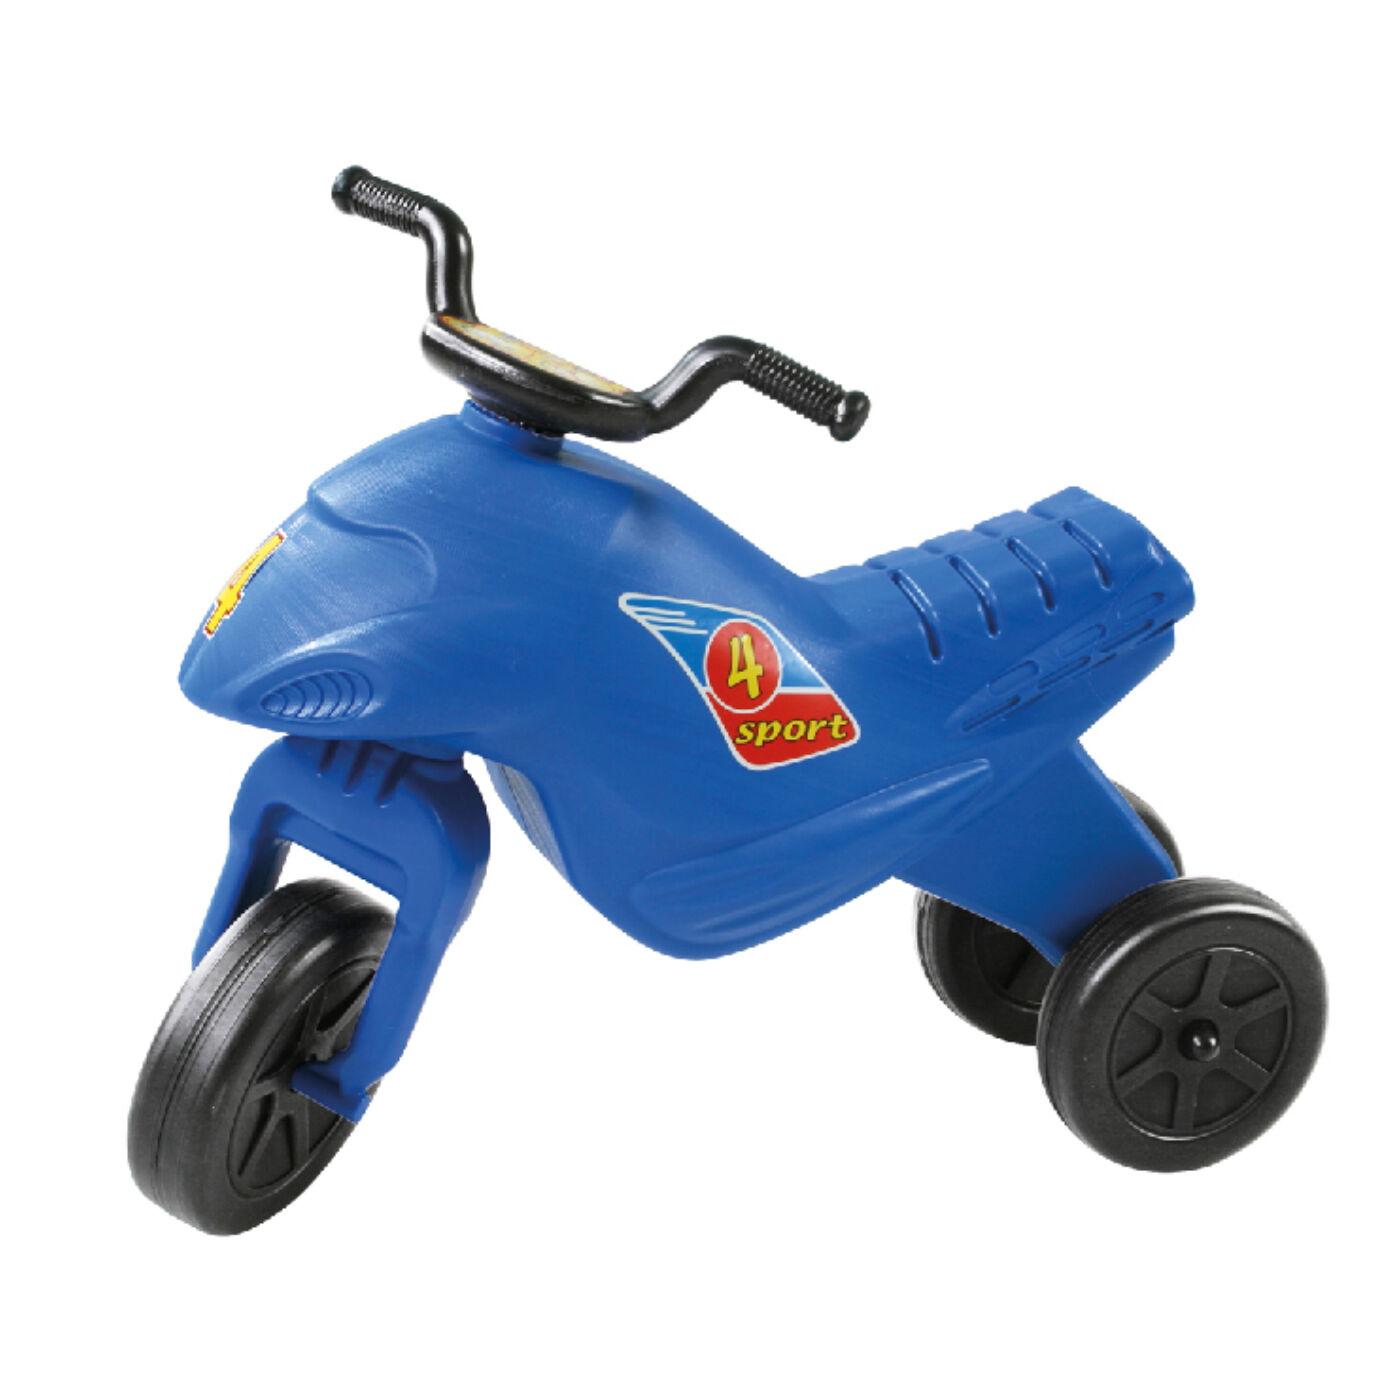 142 Super Bike 4